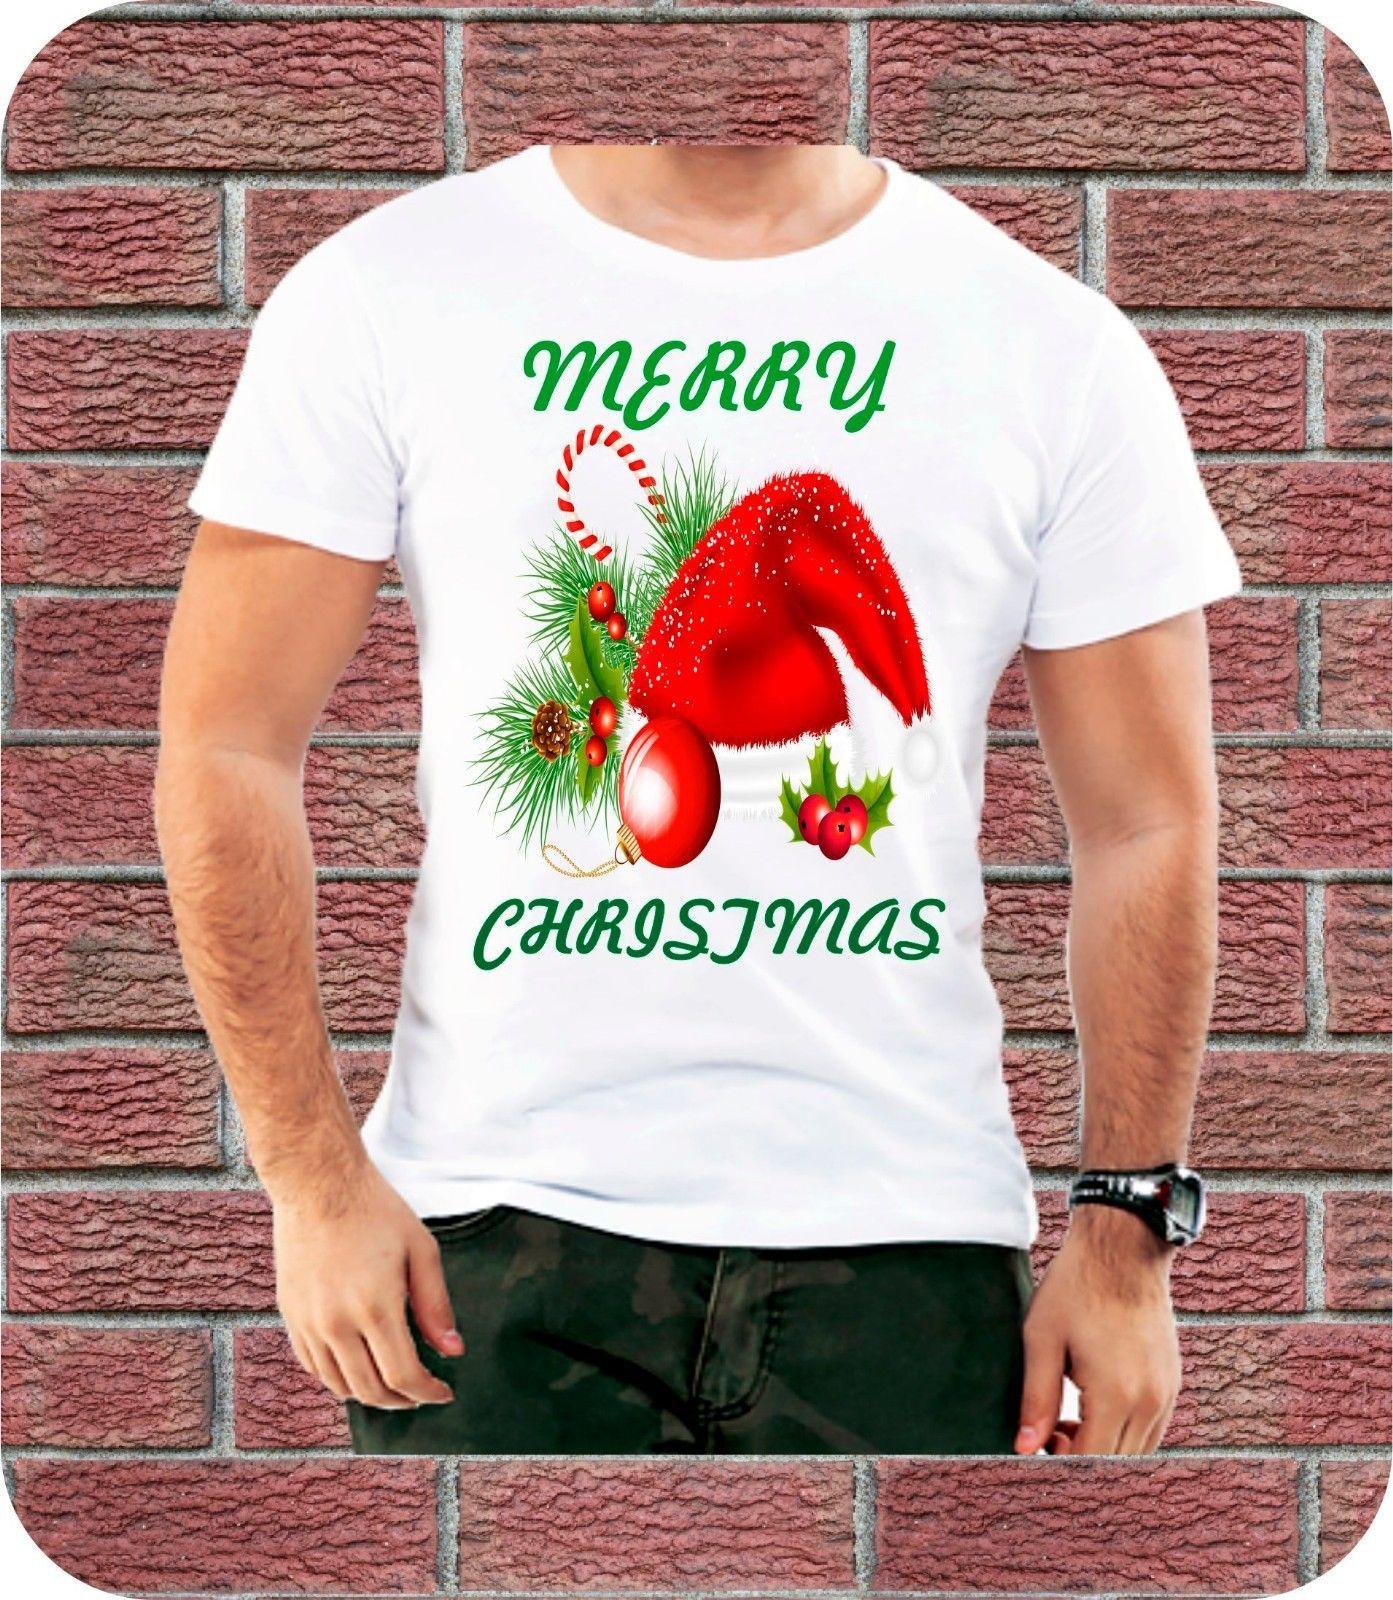 d616db59 Merry Christmas Hat Present Men T Shirt Xmas Gift Tree Candy Cane Red Santa  Snow Cartoon T Shirt Men Unisex New Fashion Tshir Latest T Shirt Designs  Coolest ...